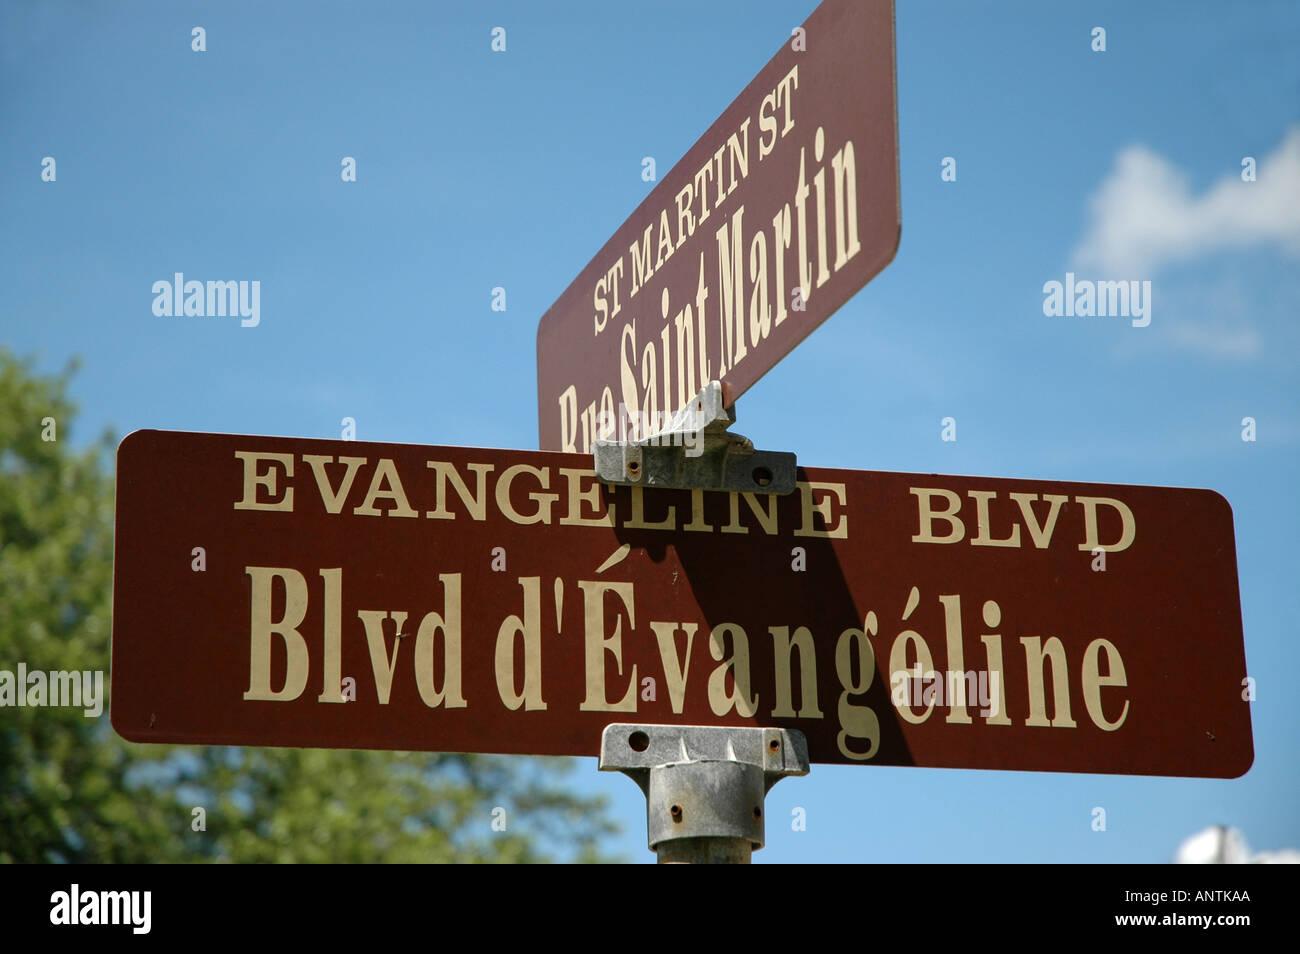 LOUISIANA Evangeline Blvd sign st martinsville Henry Wadsworth Longfellow poem - Stock Image